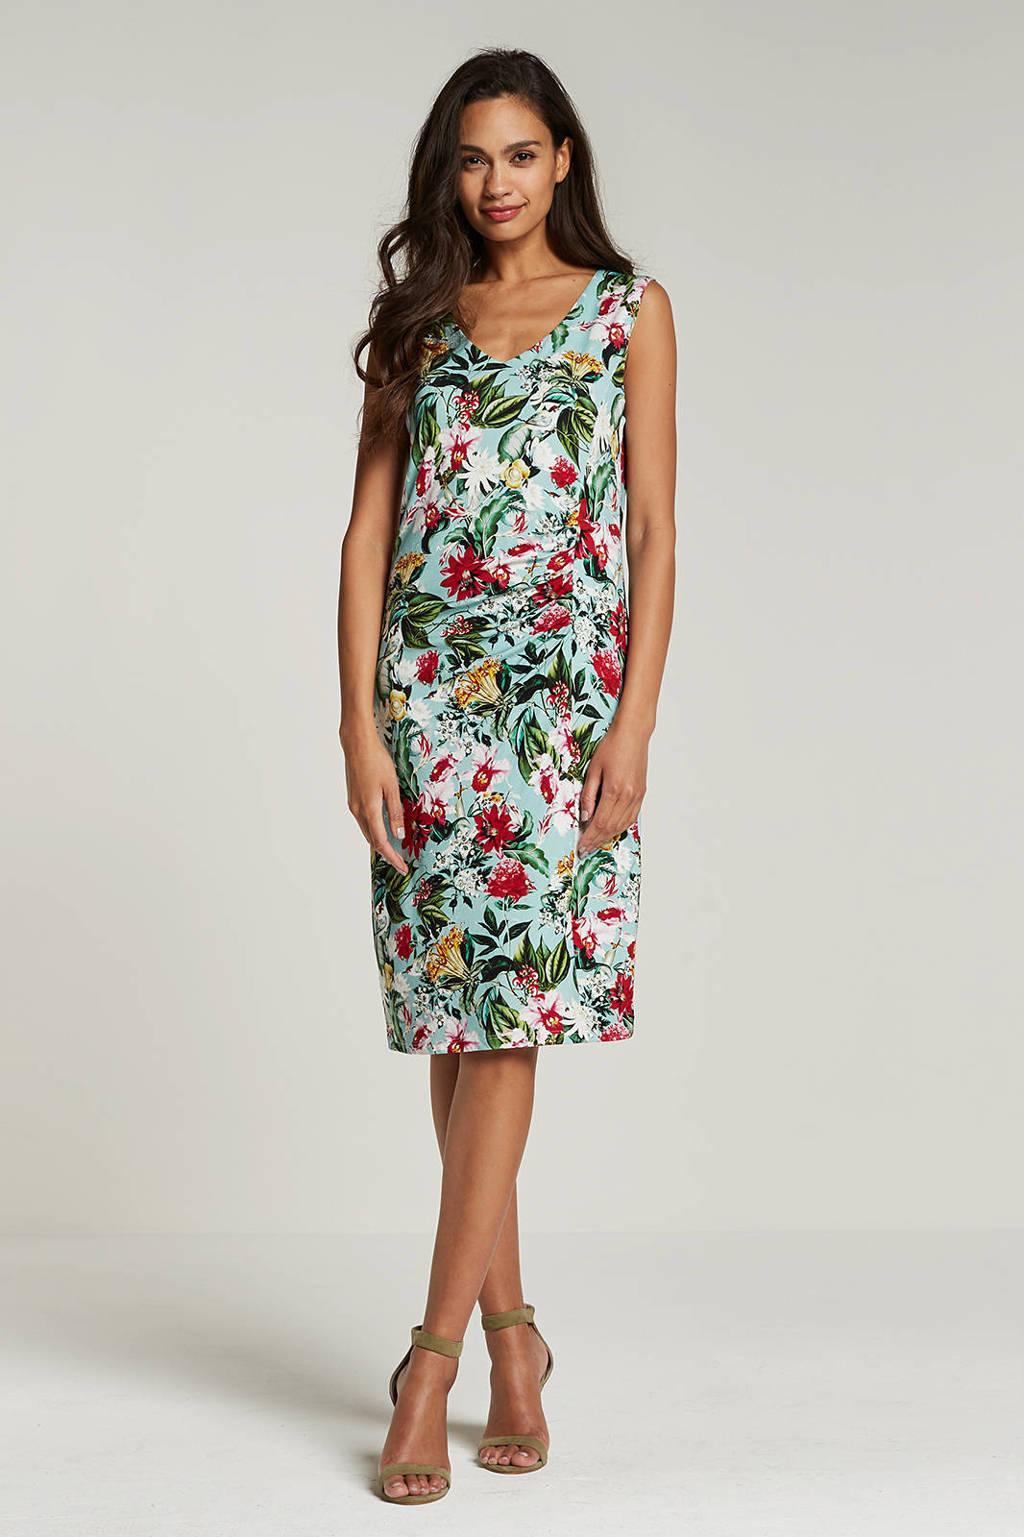 Smashed Lemon bloemen jurk, Lichtblauw/rood/roze